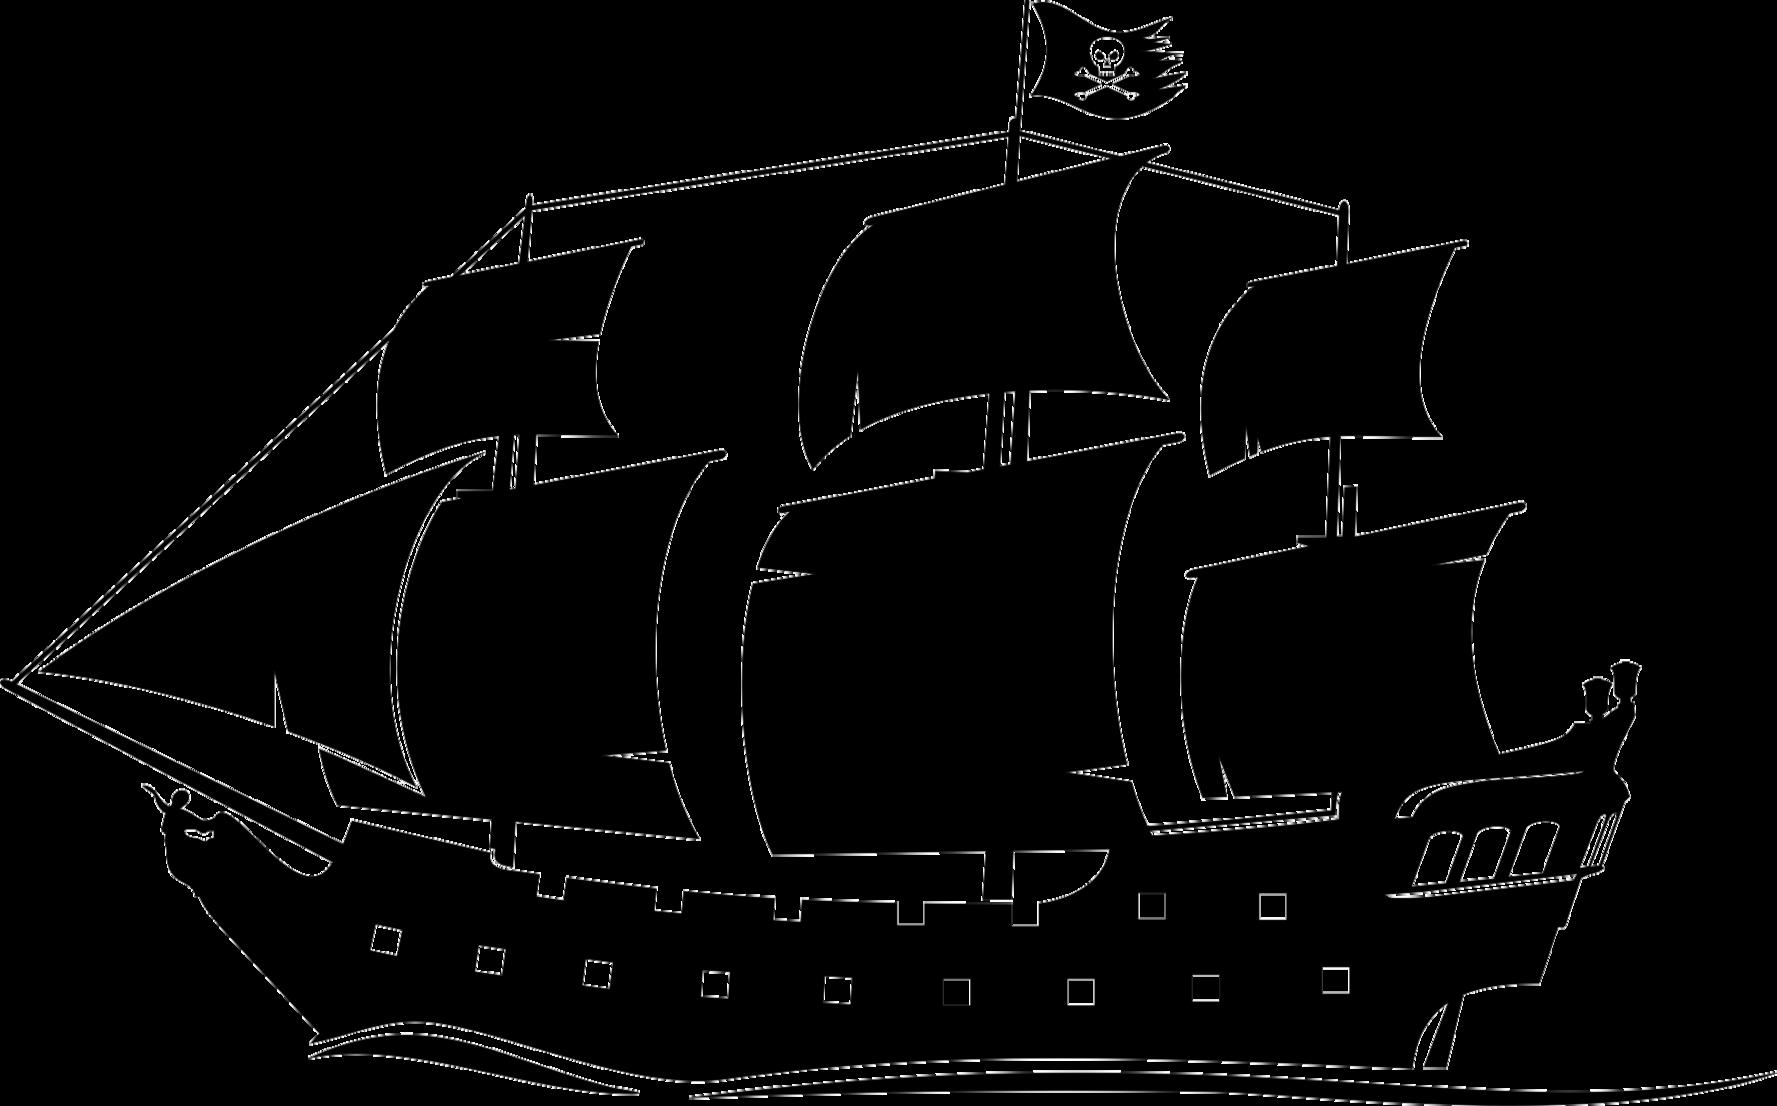 Ship Black Pearl Boat Piracy Clip art.